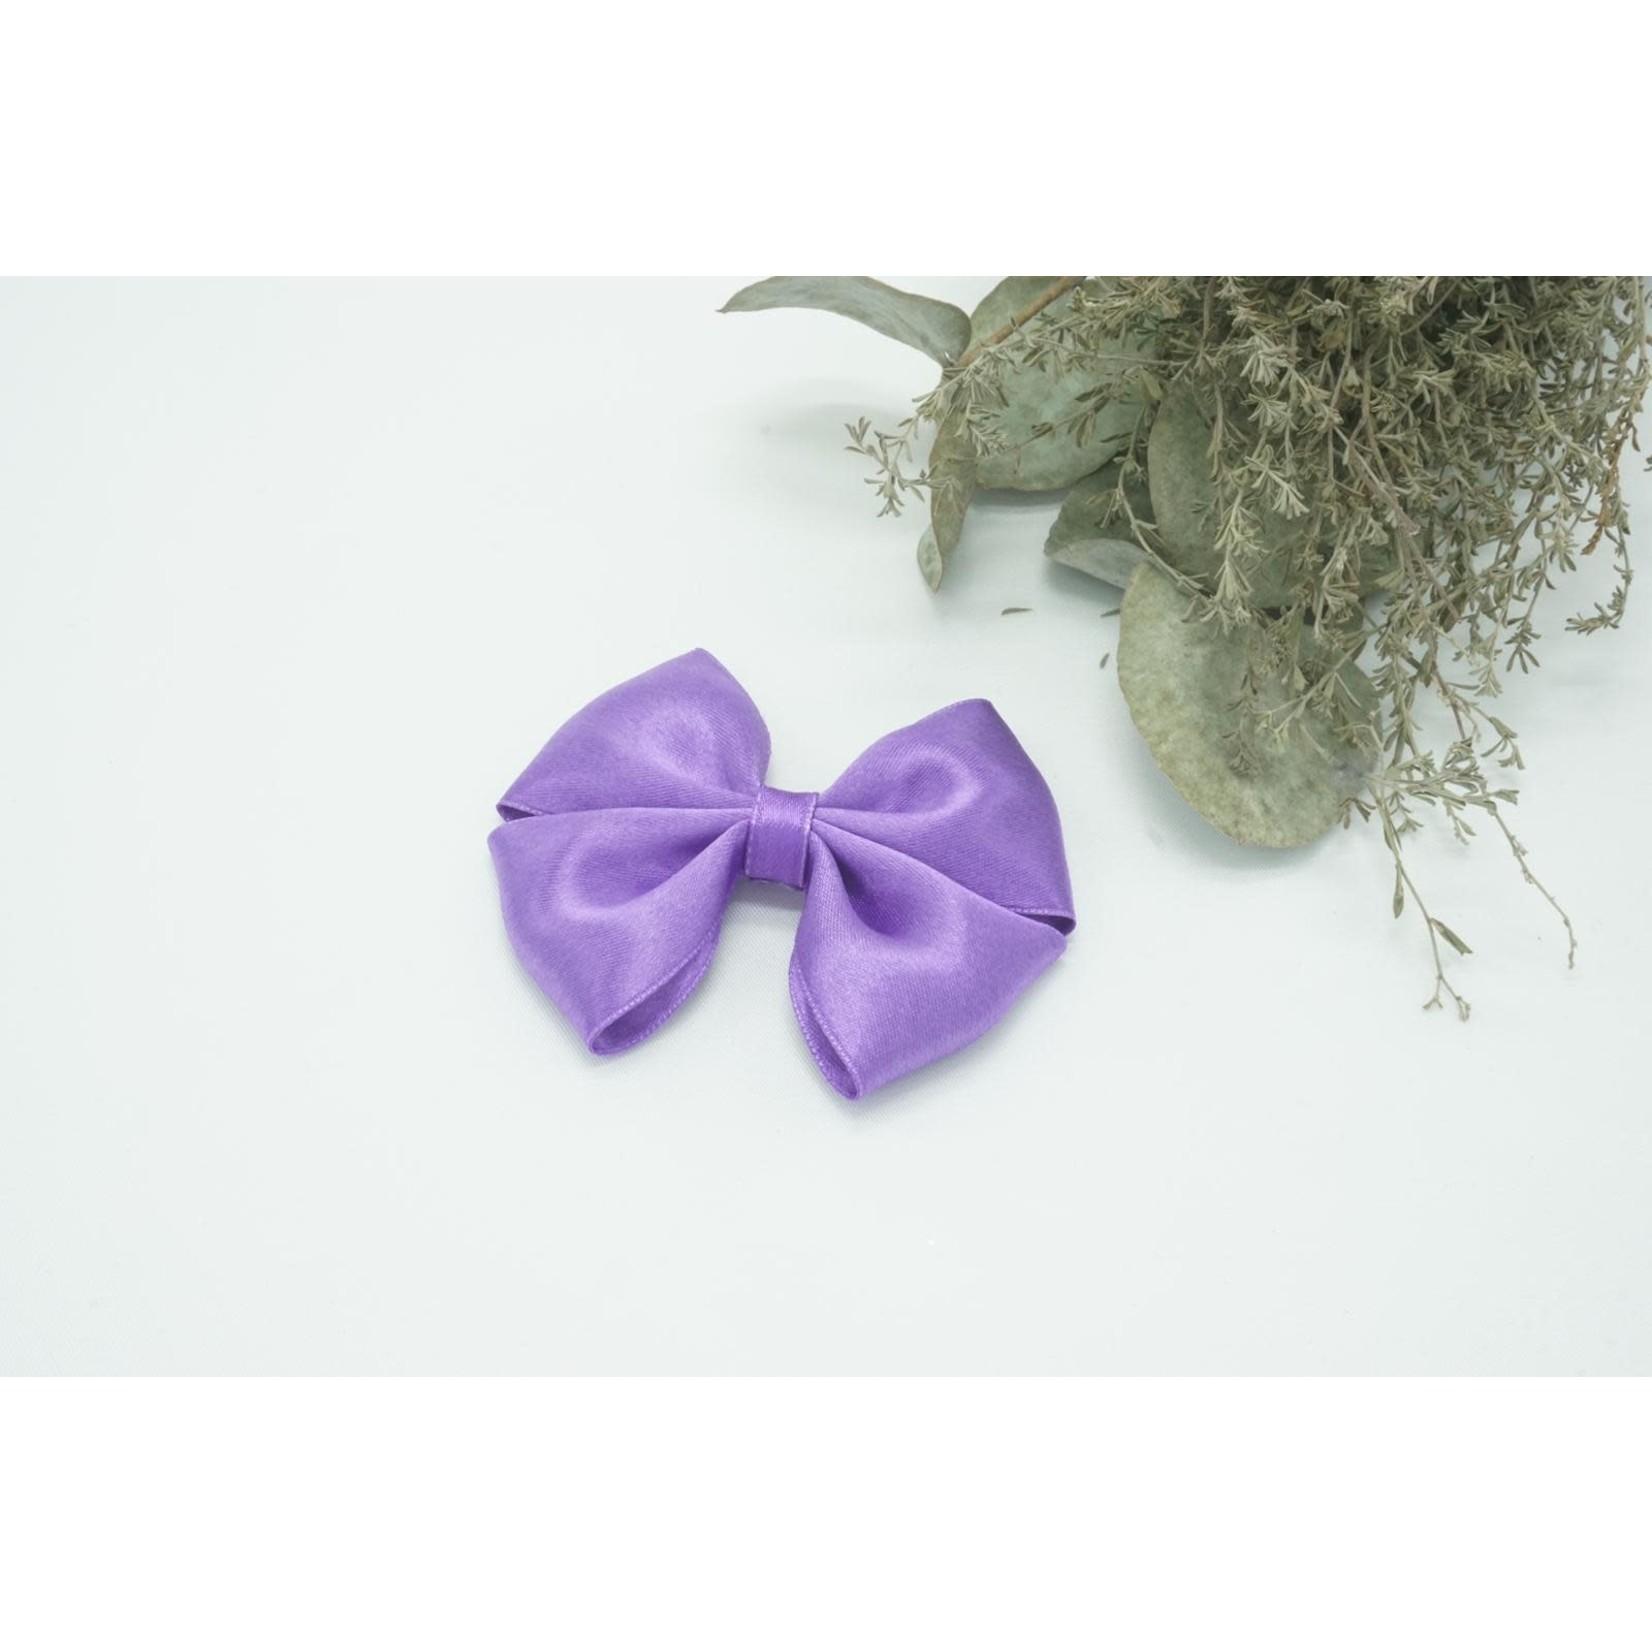 Satin Bow - Dark Violet